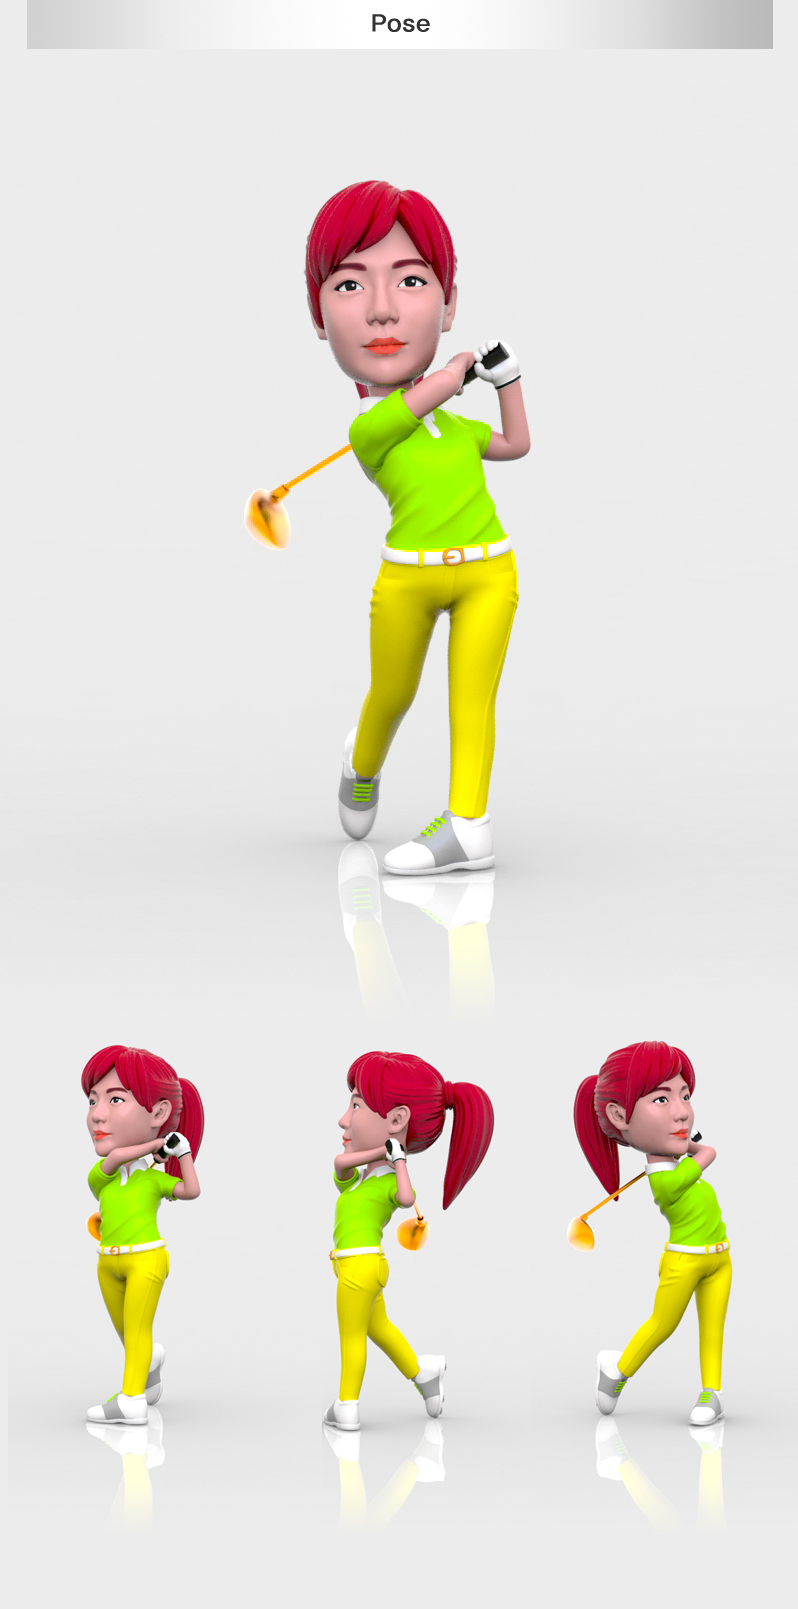 golf_w_pants_pose02